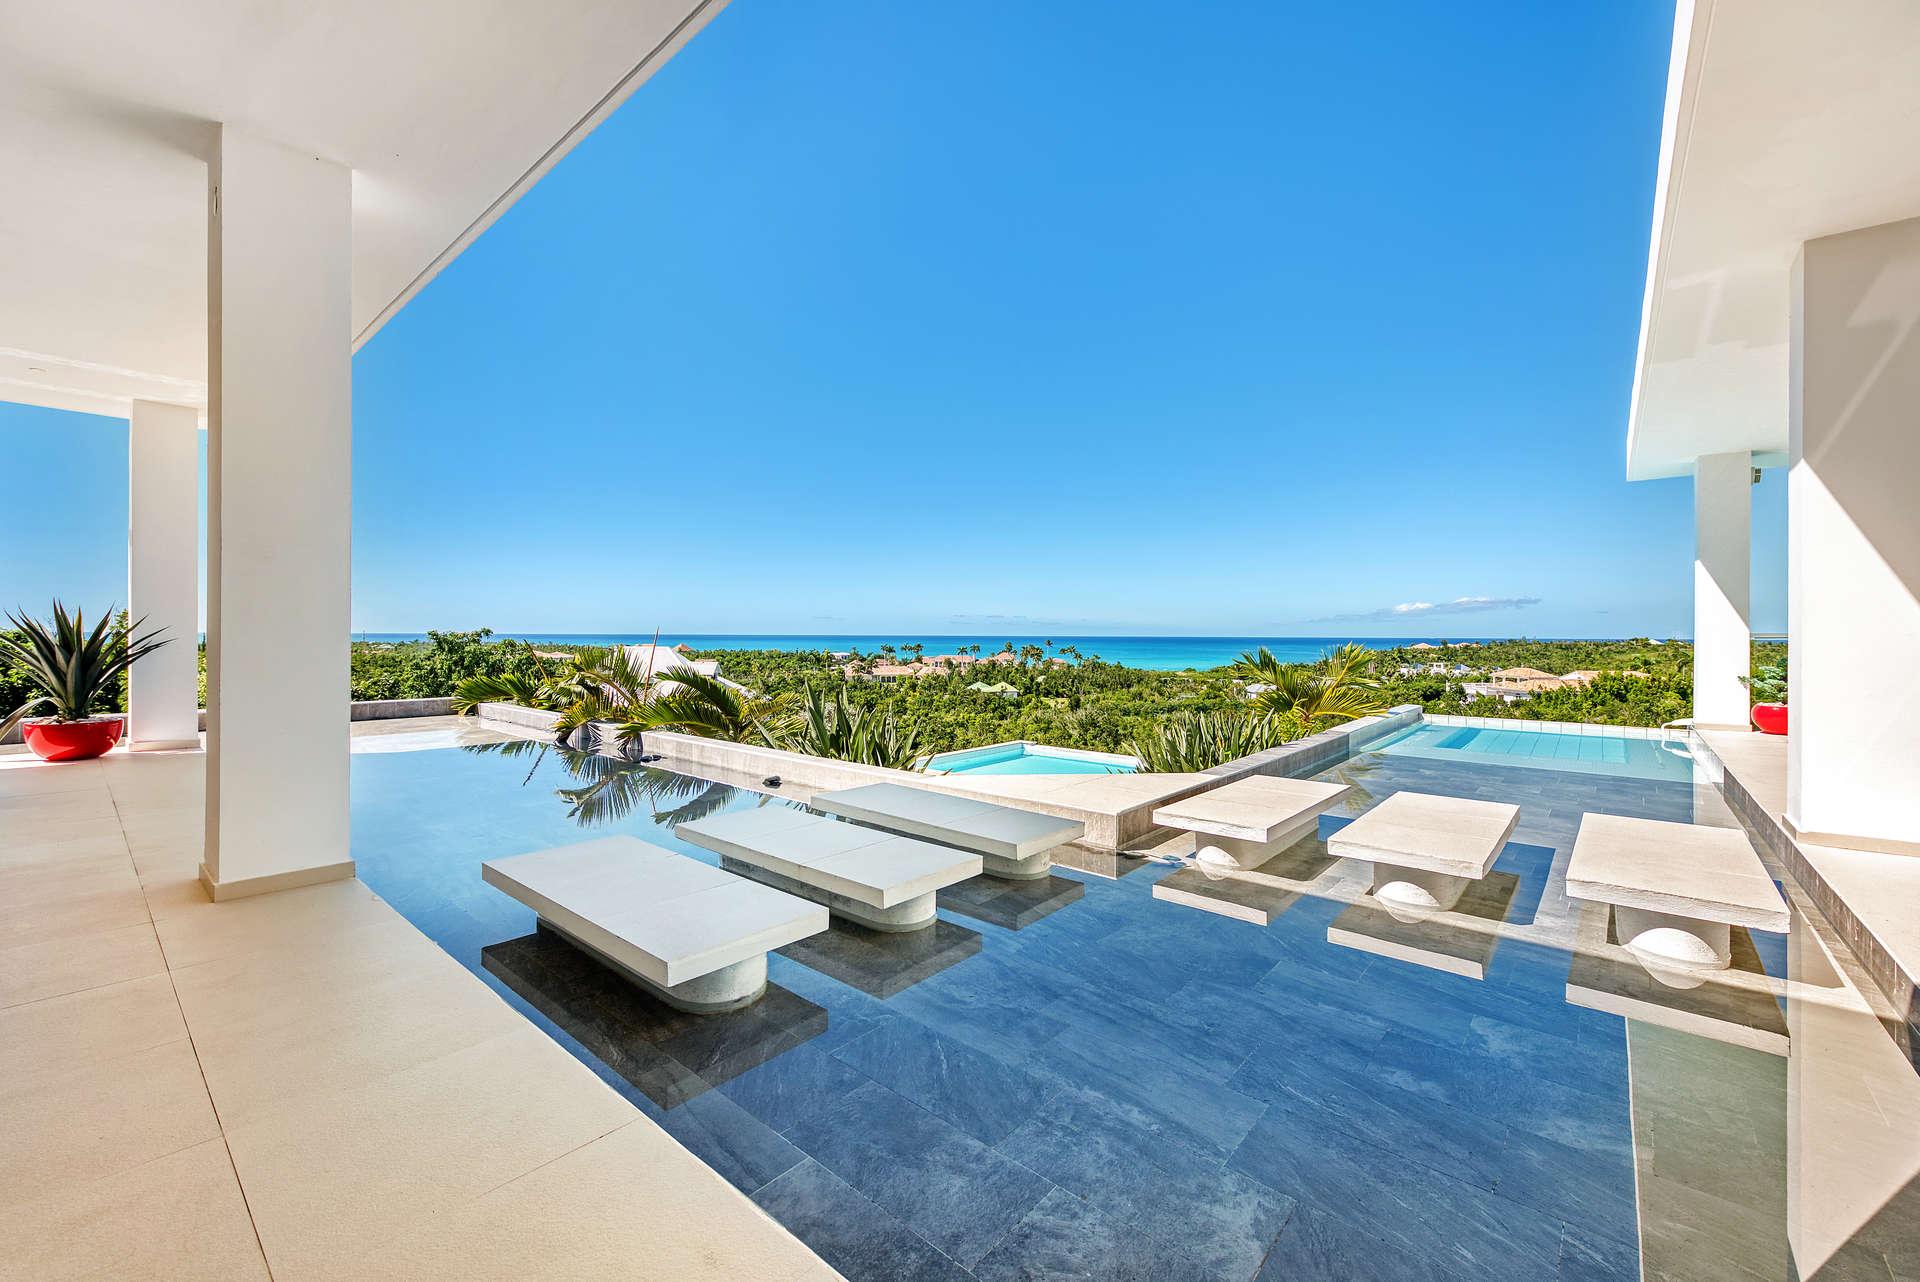 Luxury villa rentals caribbean - St martin - Saint martin french - Les terres basses - Grand Bleu - Image 1/27